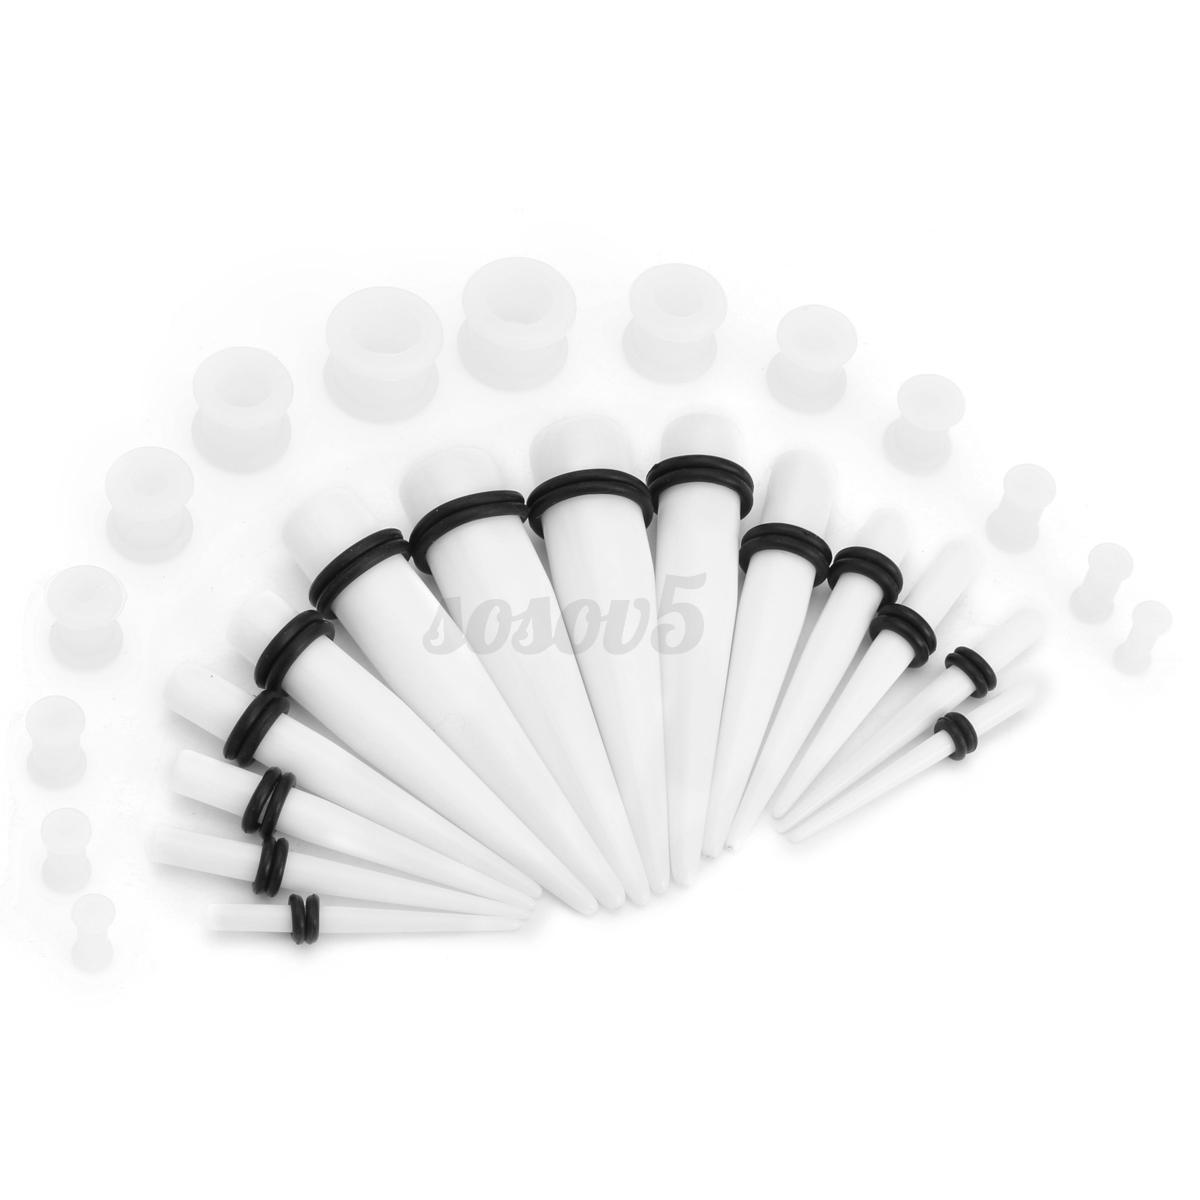 28pcs-Conica-Ear-Expansor-Tapon-Oido-Dilatador-De-Estiramiento-Piercing-Kits-Set